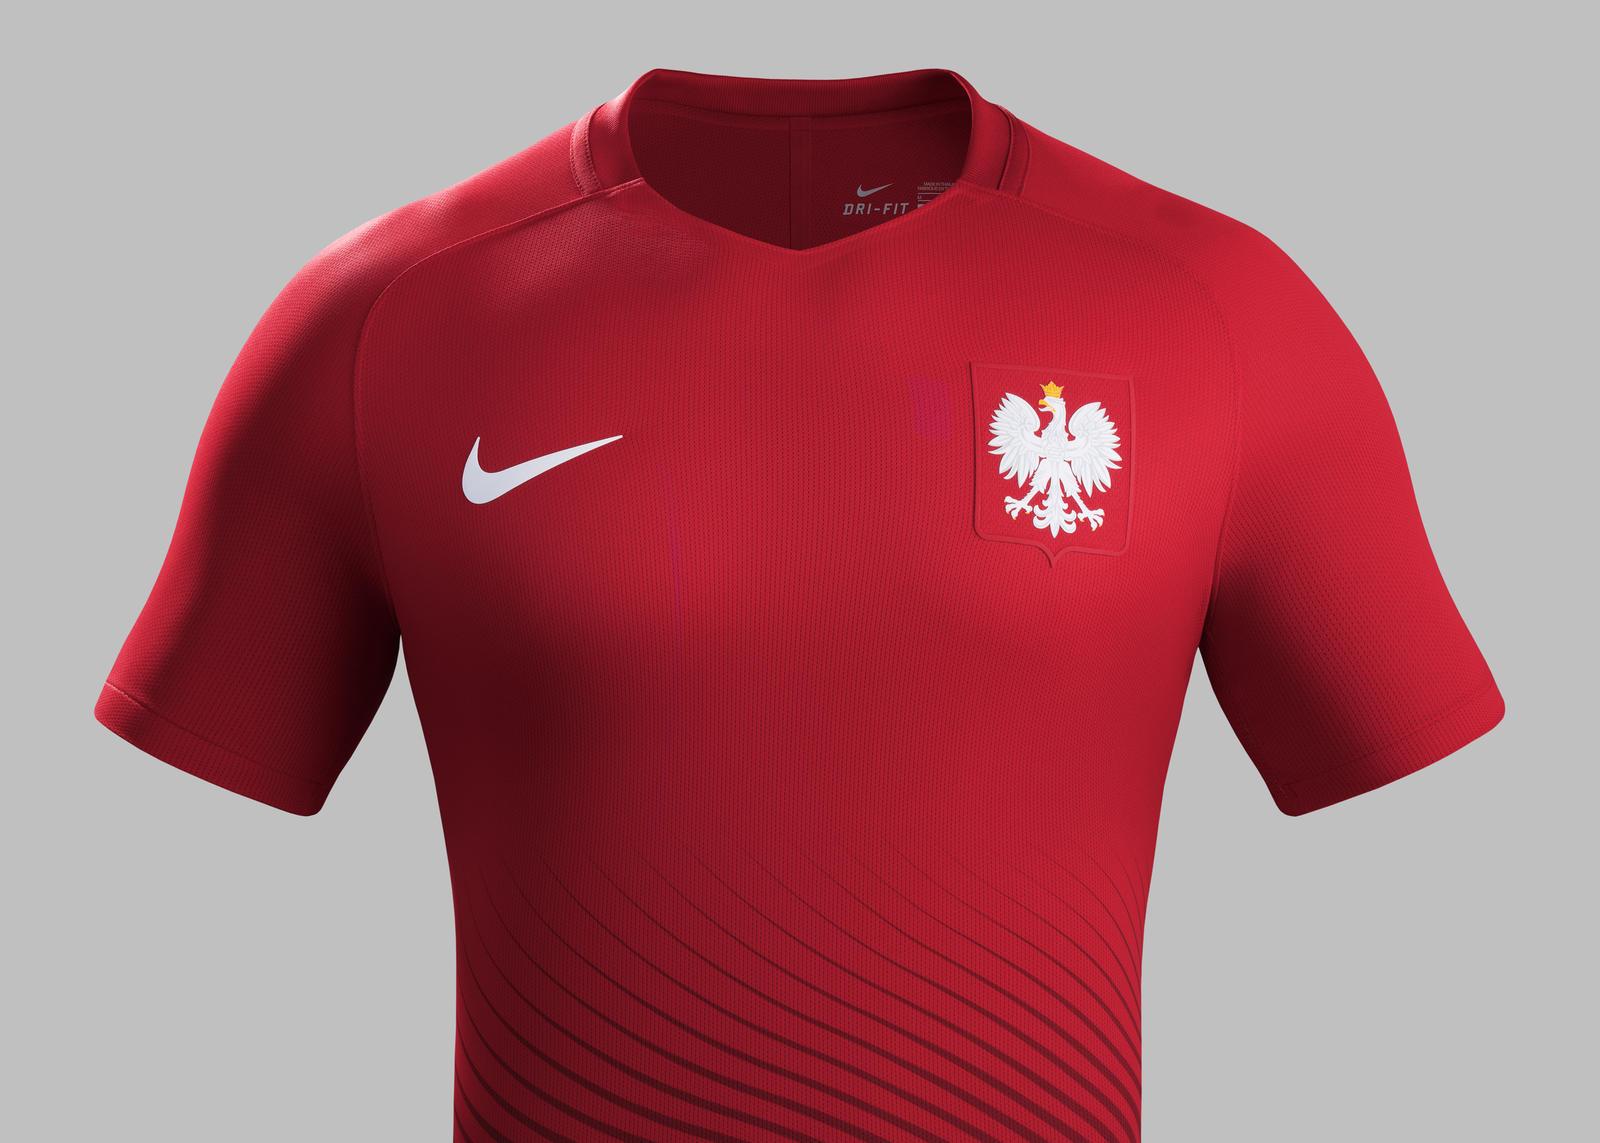 Poland national football kits nike news jpg 1600x1143 Poland soccer jacket 4938e662e